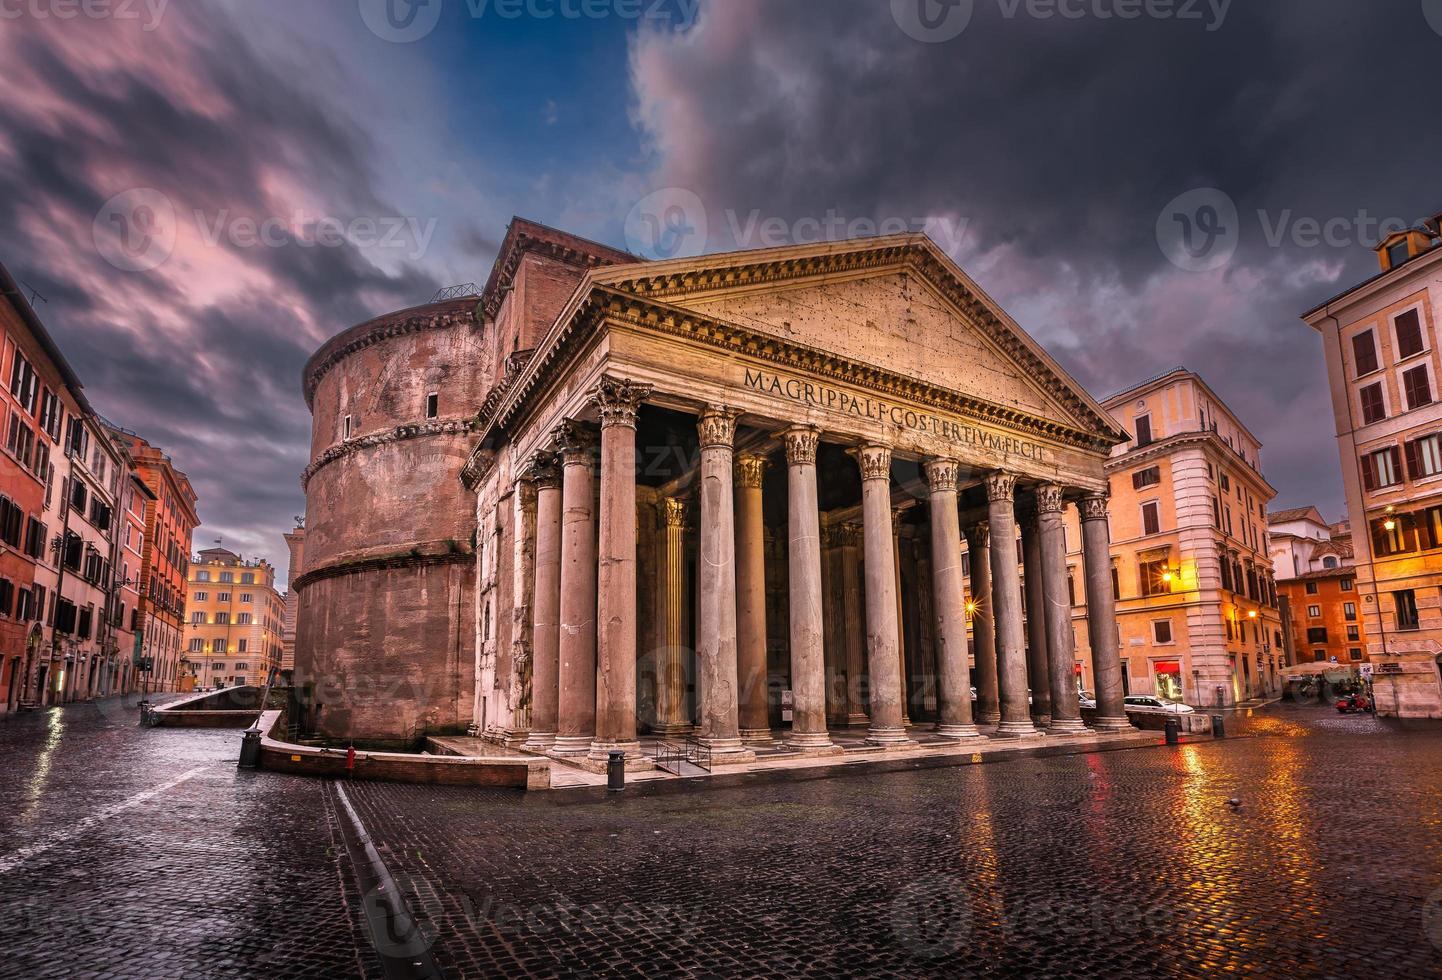 piazza della rotonda en pantheon in de ochtend, rome, italië foto